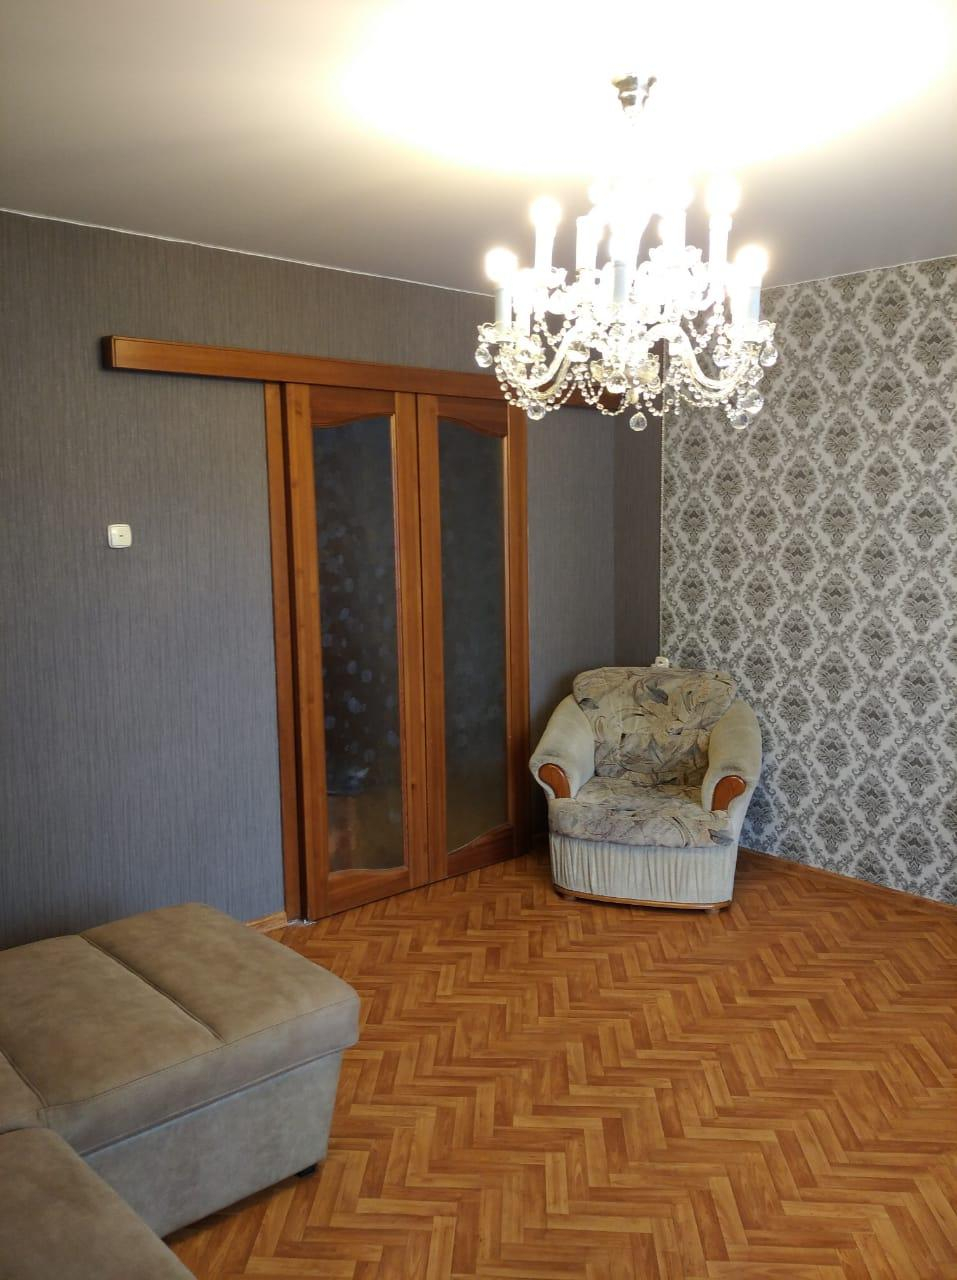 2к квартира Новосибирская улица, 31 | 25000 | аренда в Красноярске фото 0